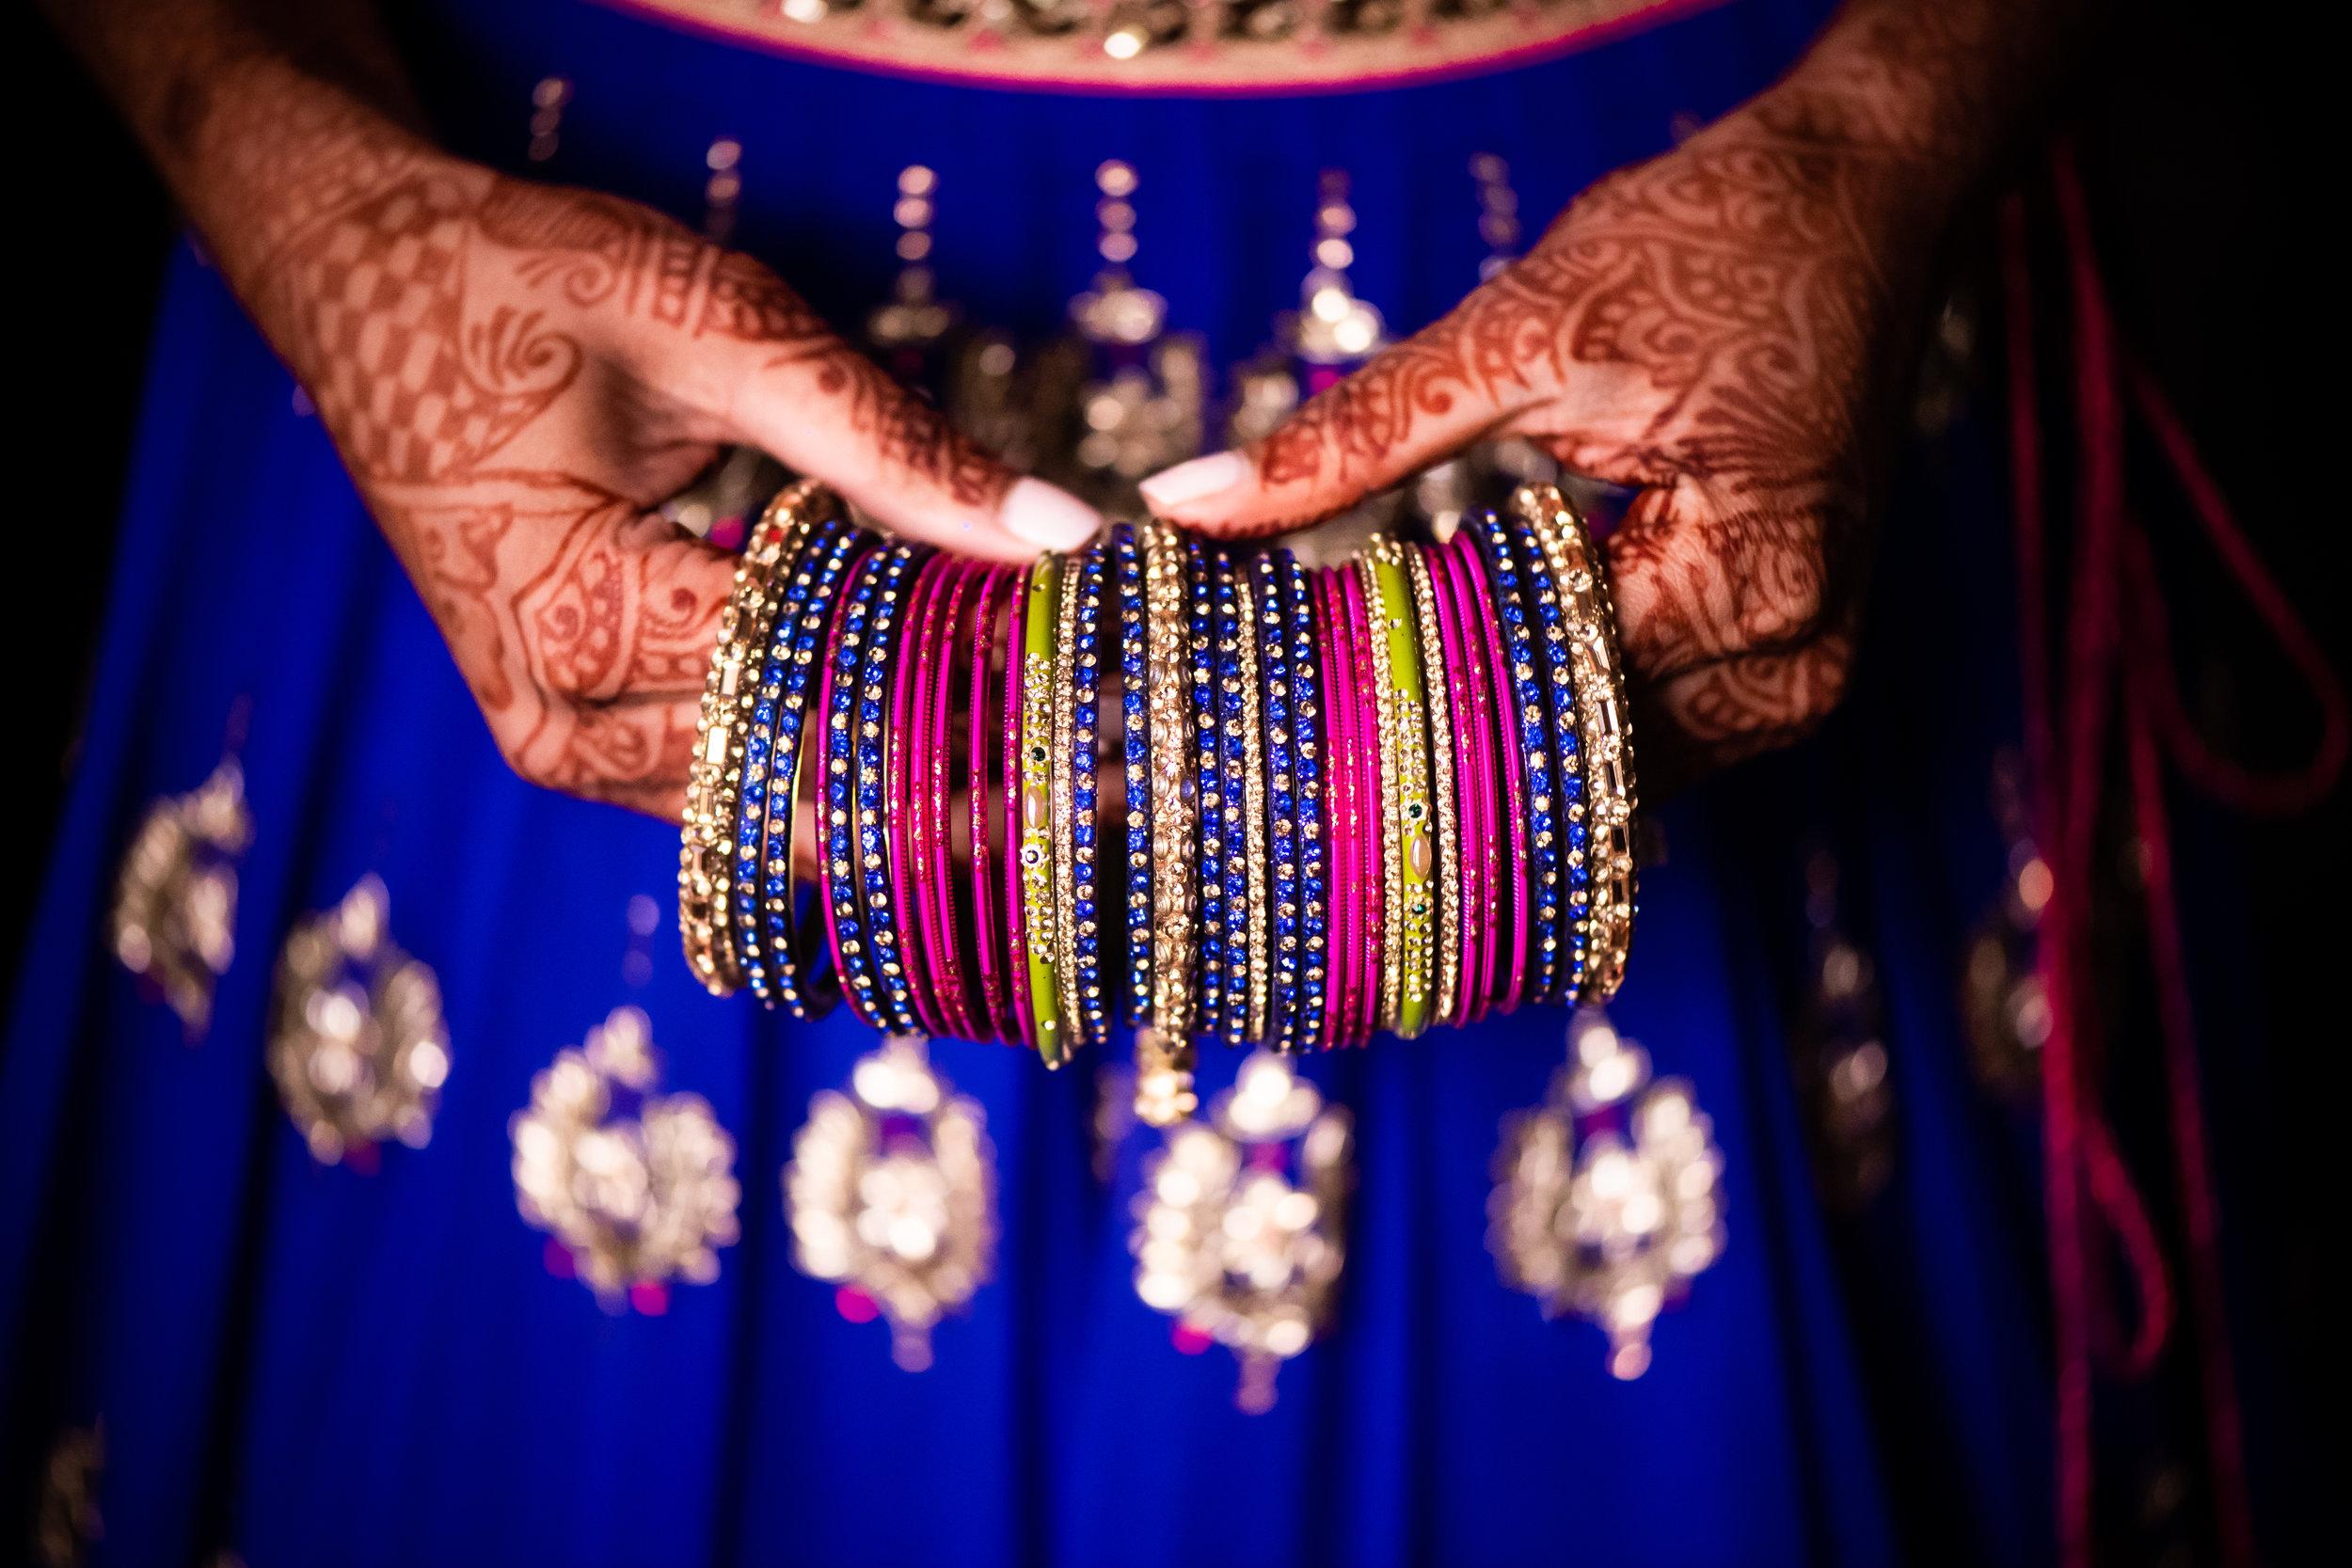 INDIAN WEDDING SANGEET BRIDE HENNA AND JEWELRY.jpg